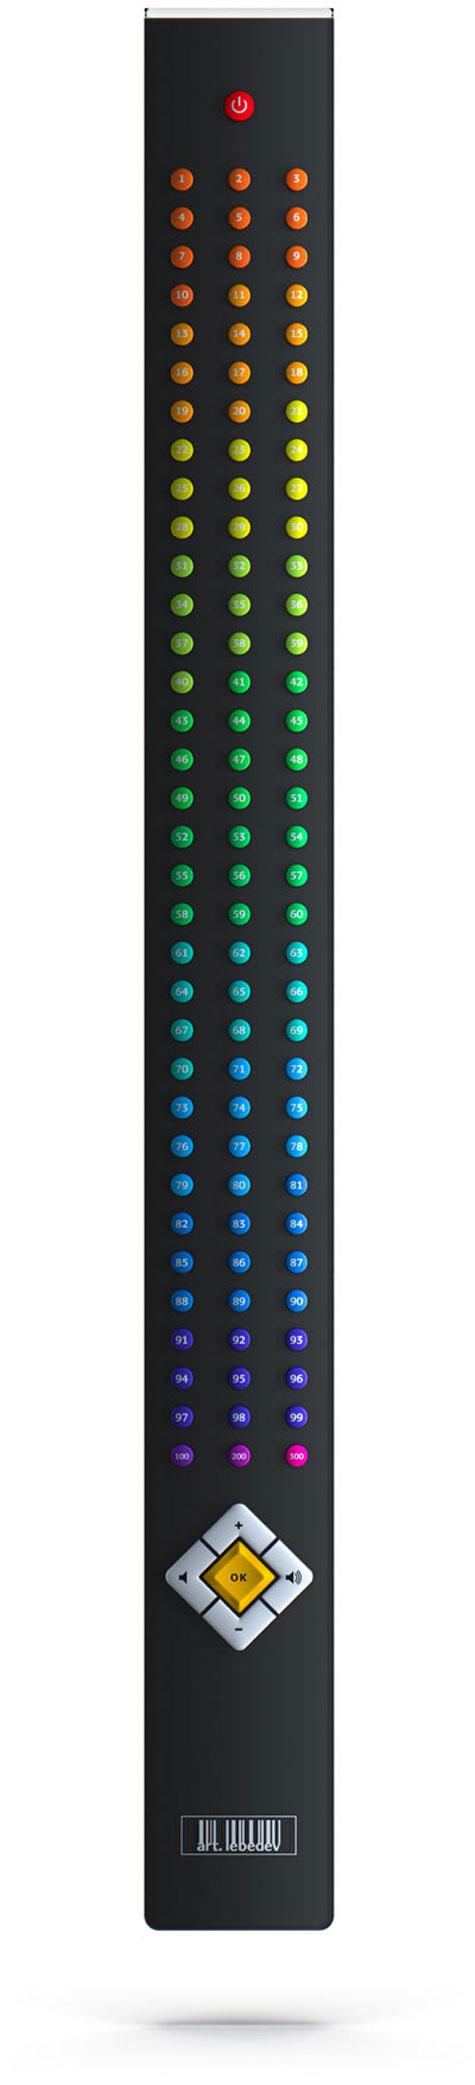 Pultius TV Remote Control » image 1